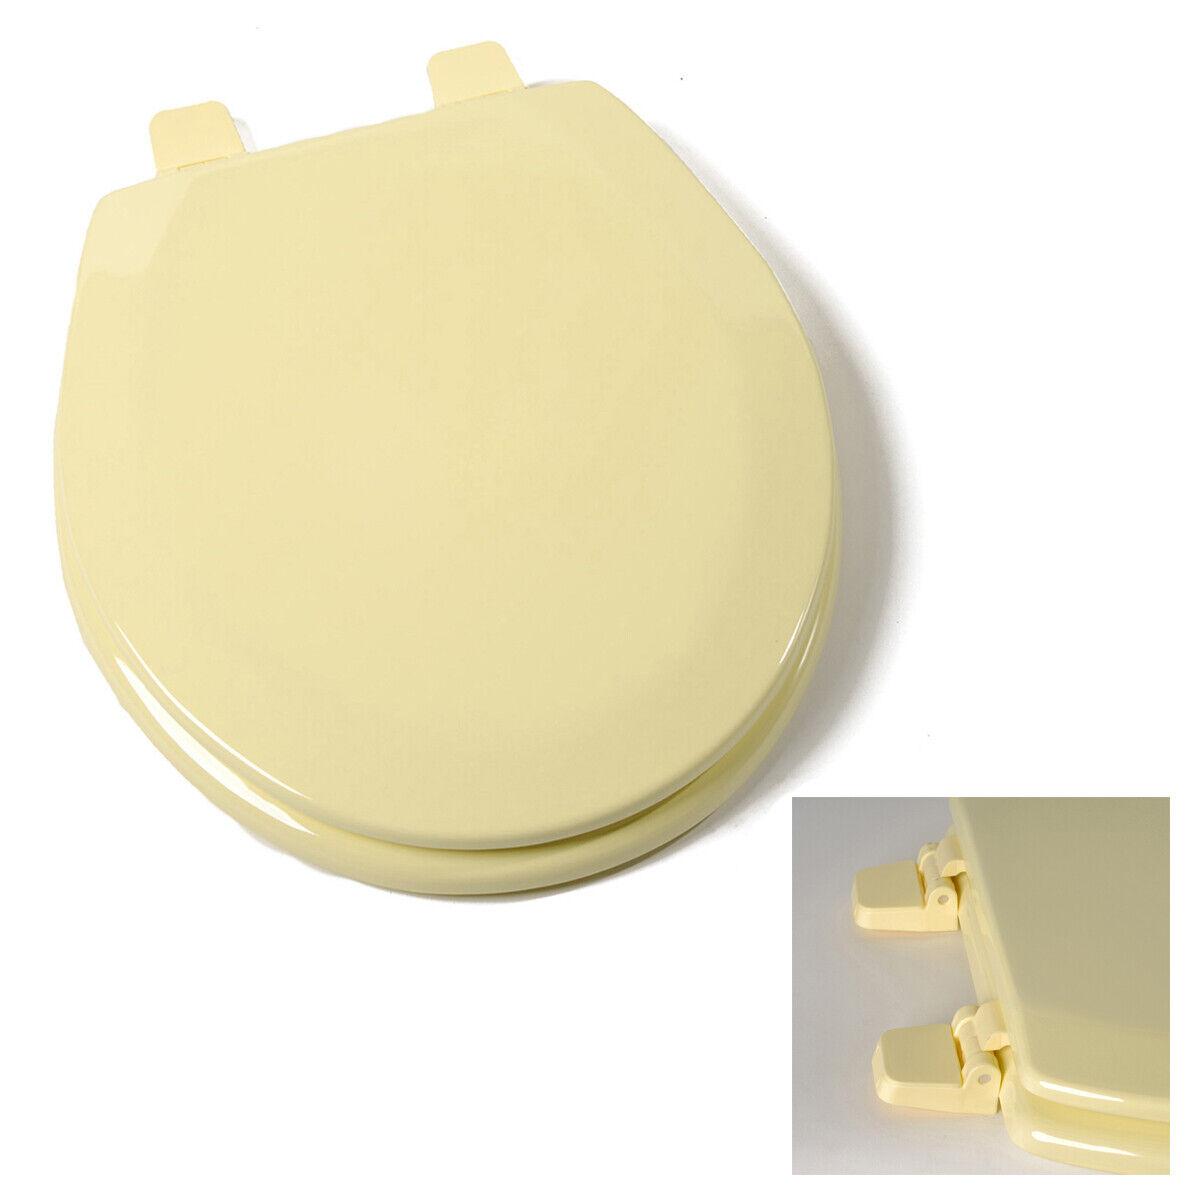 Deluxe Citron Yellow Round Wood Toilet Seat, Adjustable Hinges Bath